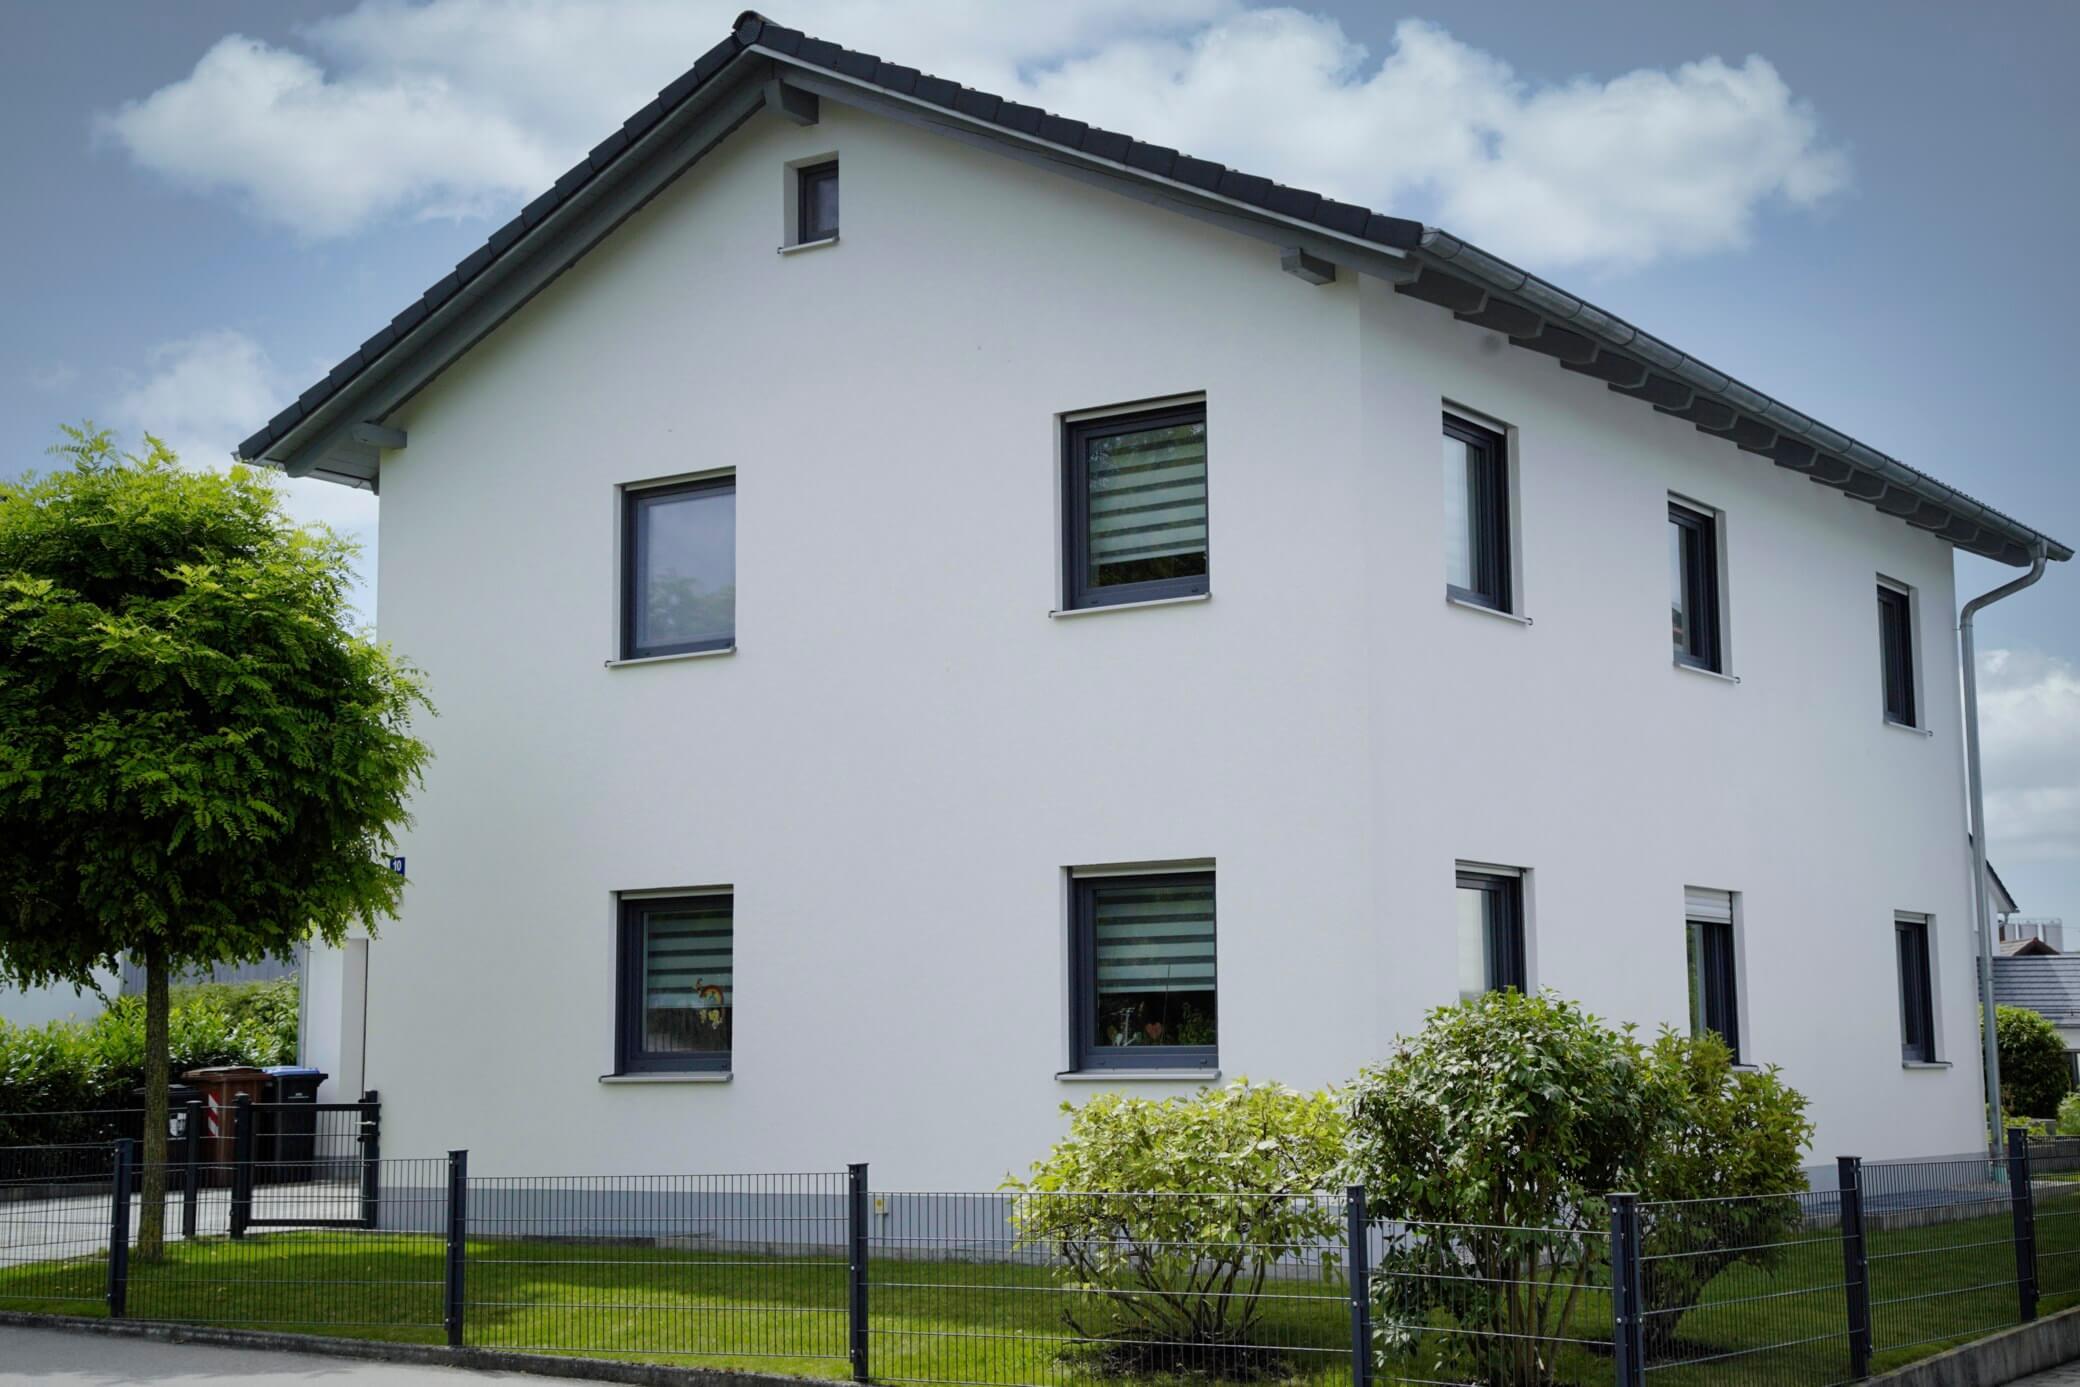 K&K Bau GmbH Massivhaus Referenzbild 16